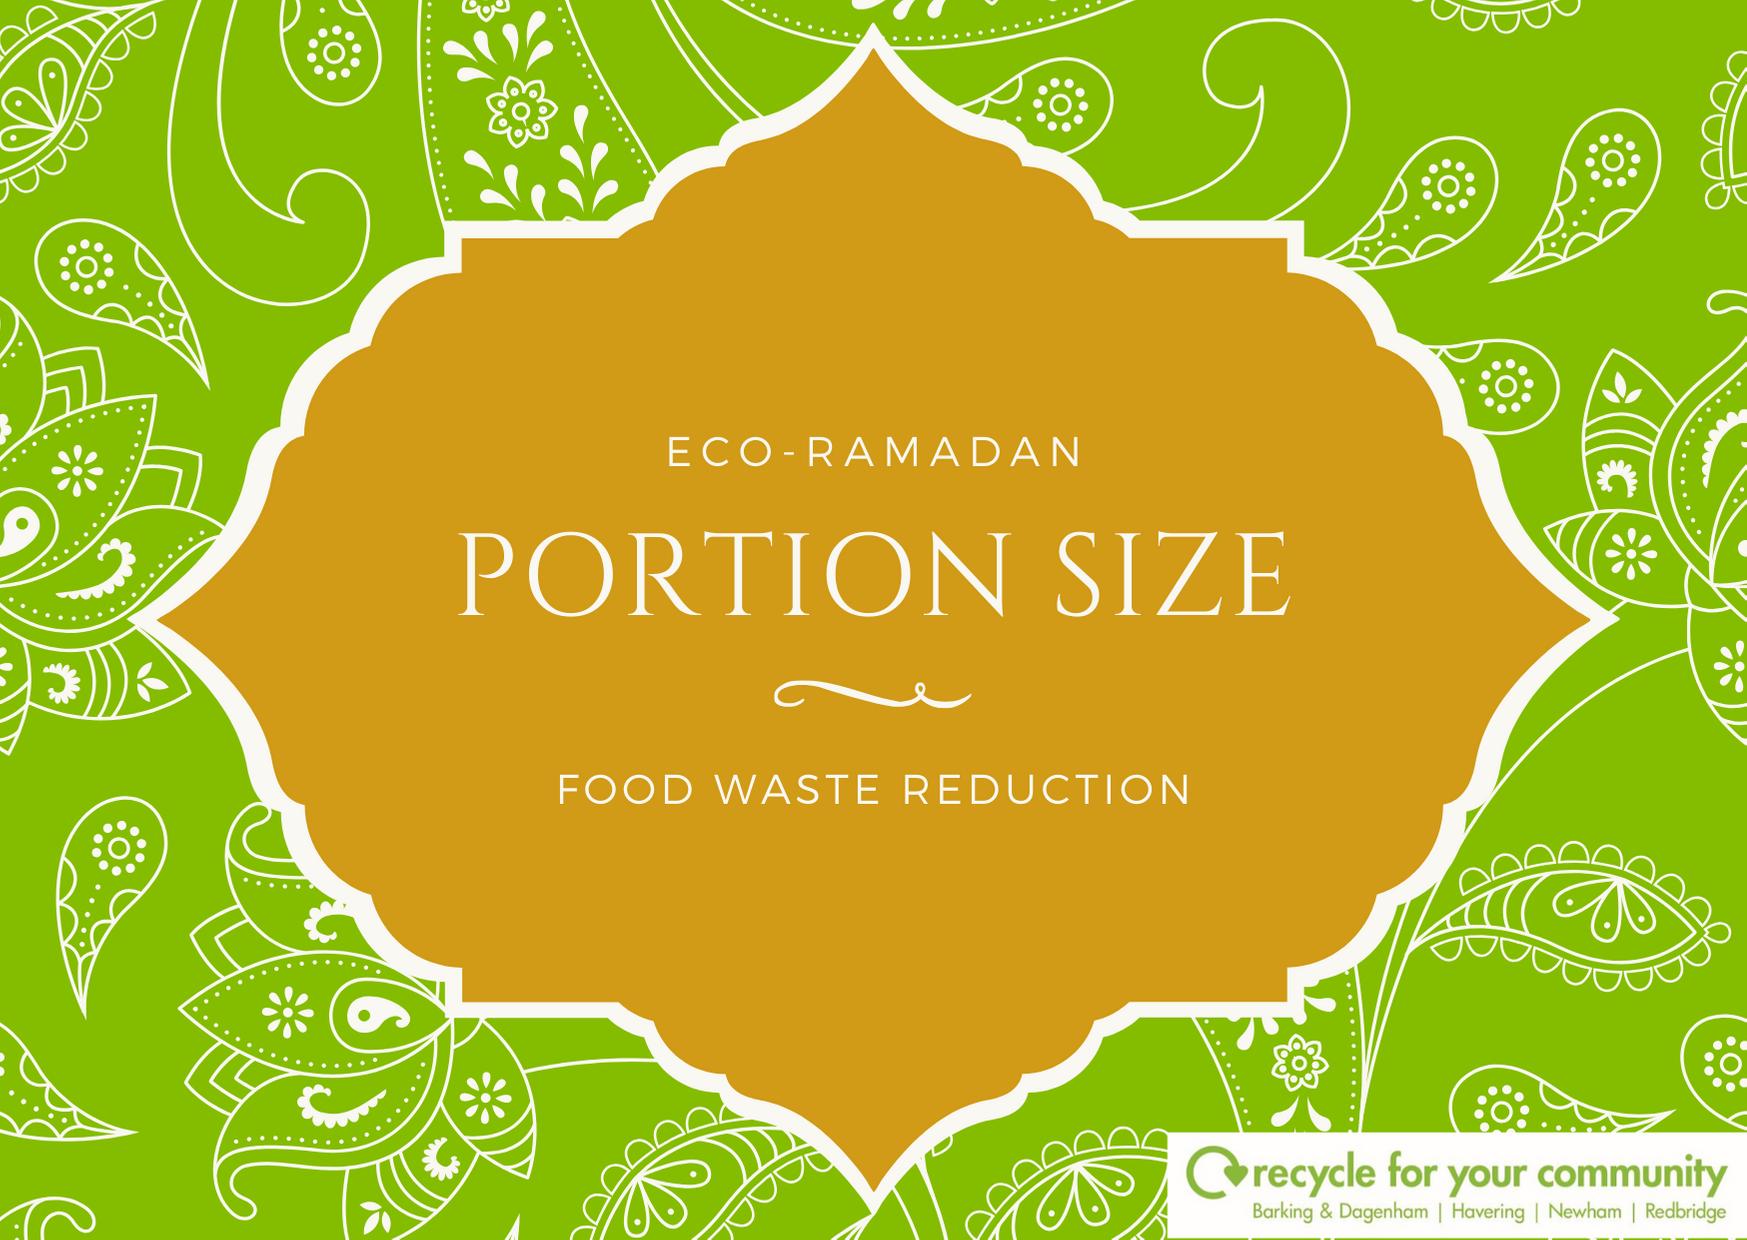 Portion Size